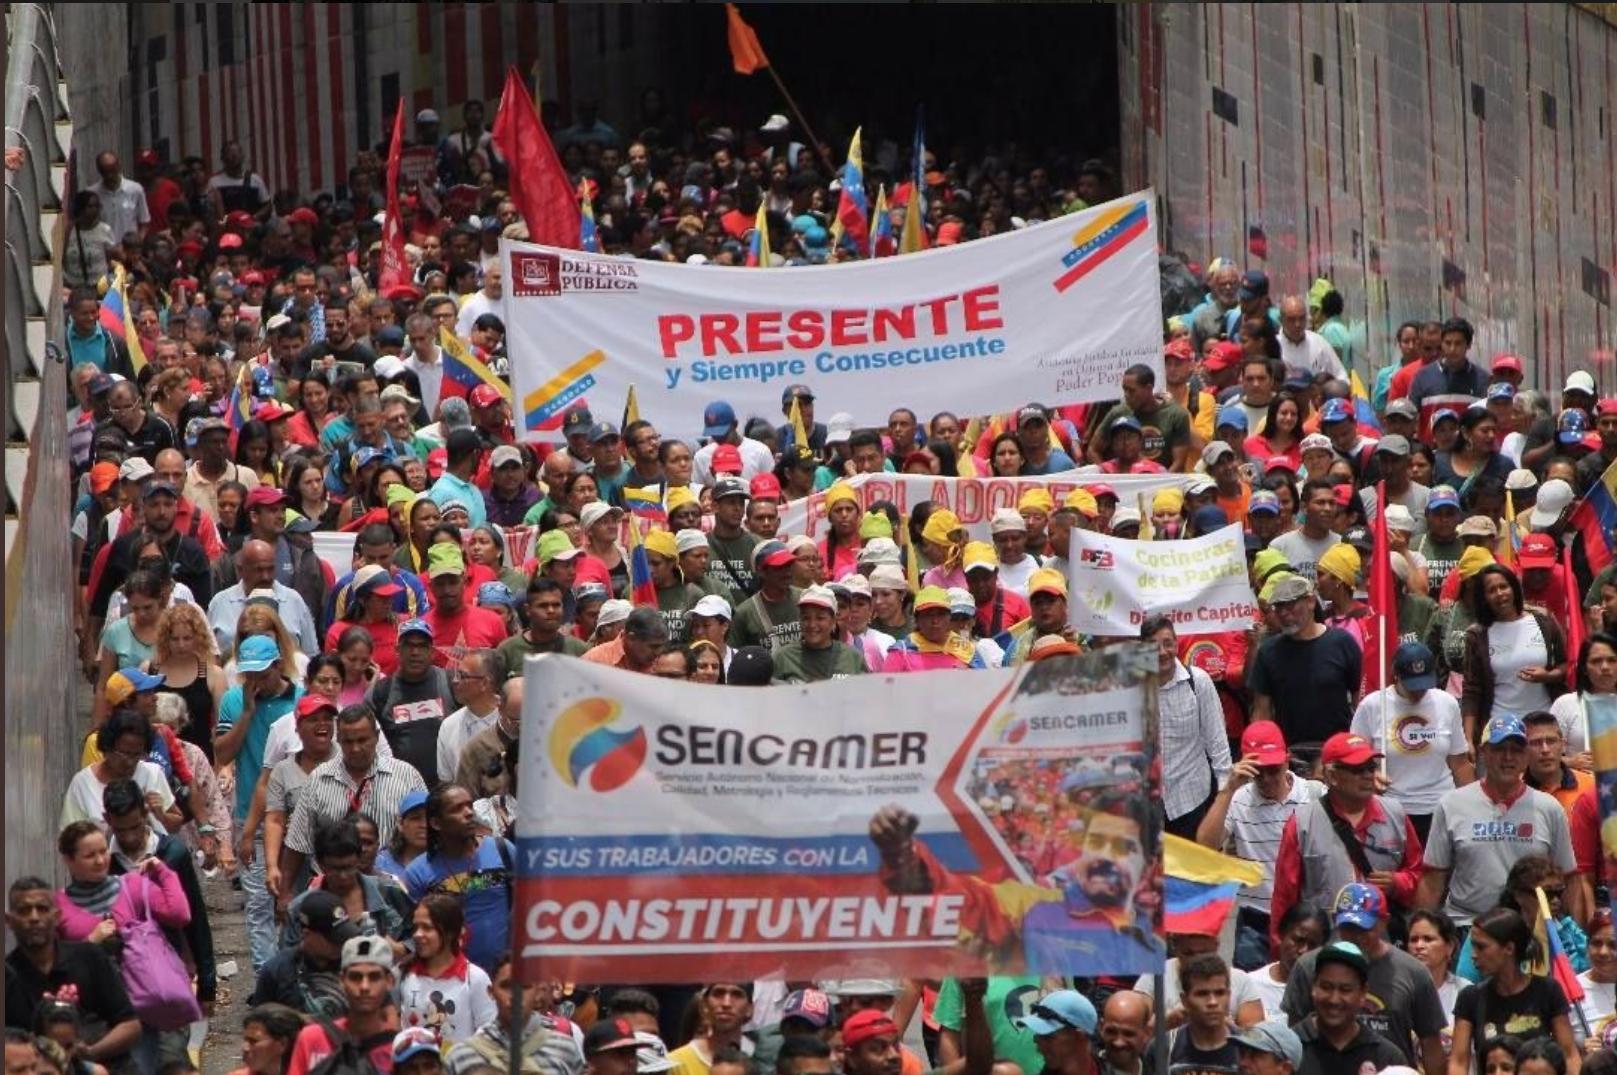 Venezuela Anti-Imperialist March